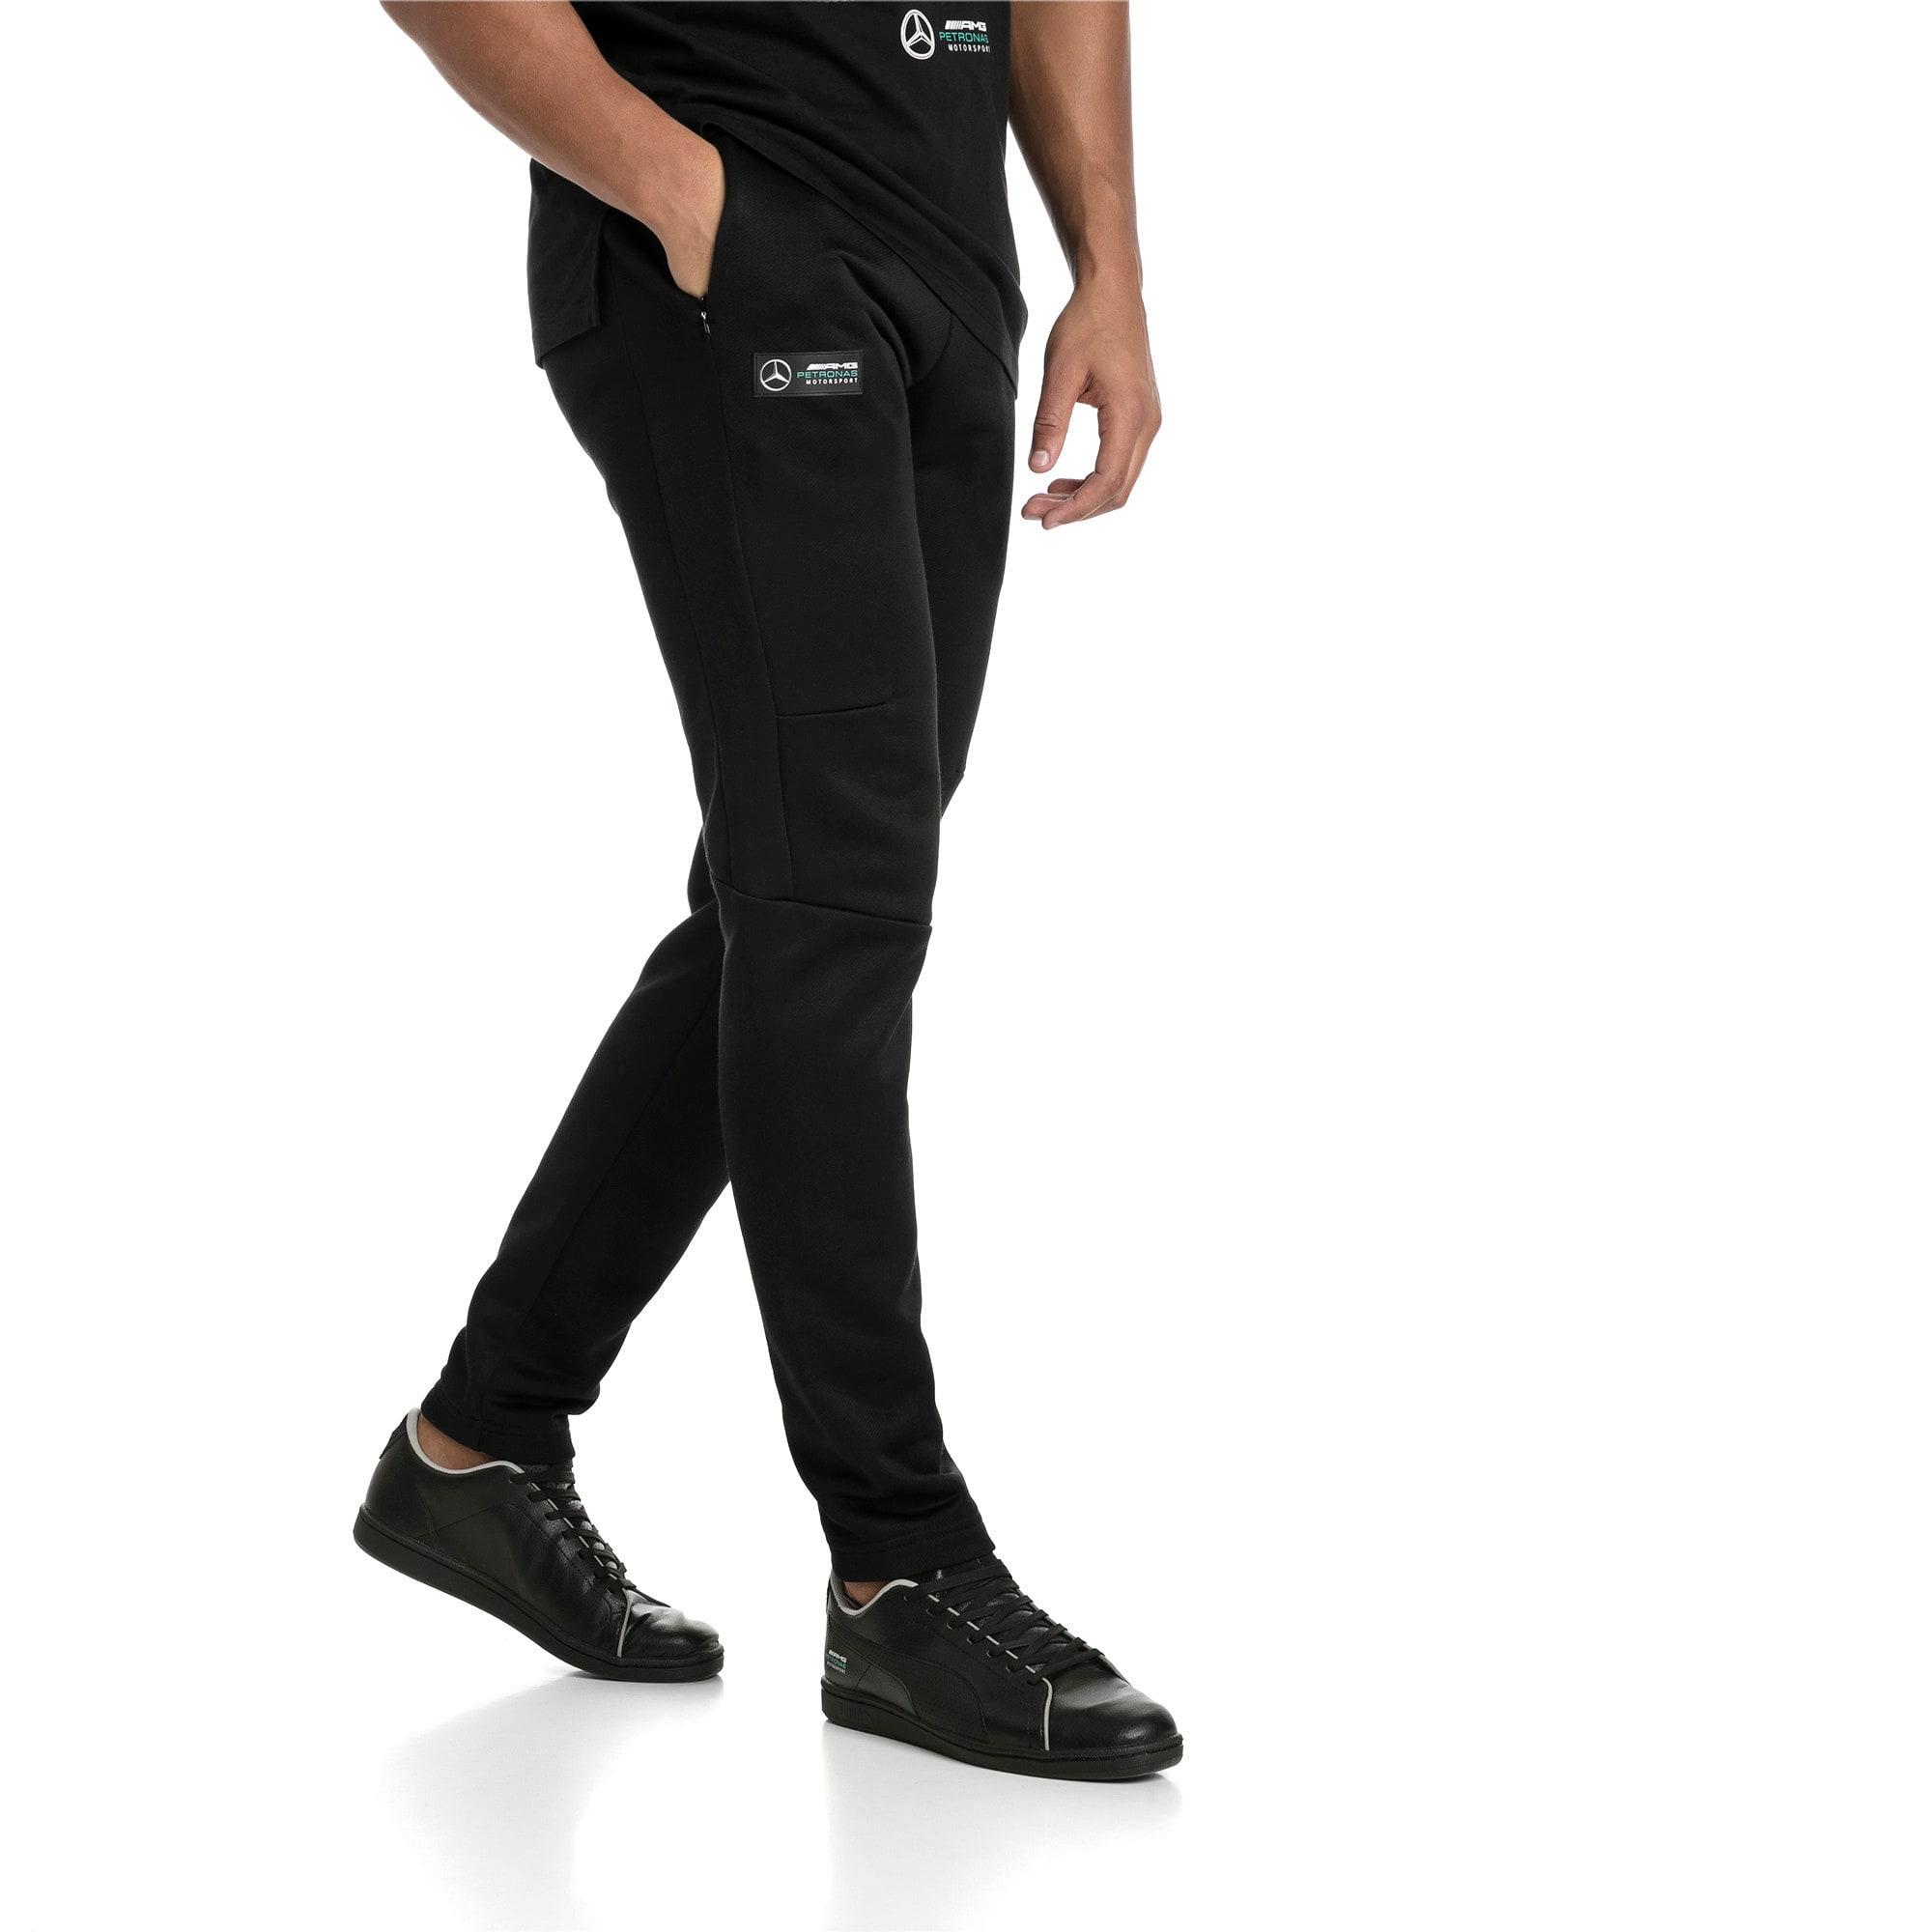 Thumbnail 2 of MERCEDES AMG PETRONAS Men's T7 Track Pants, Puma Black, medium-IND